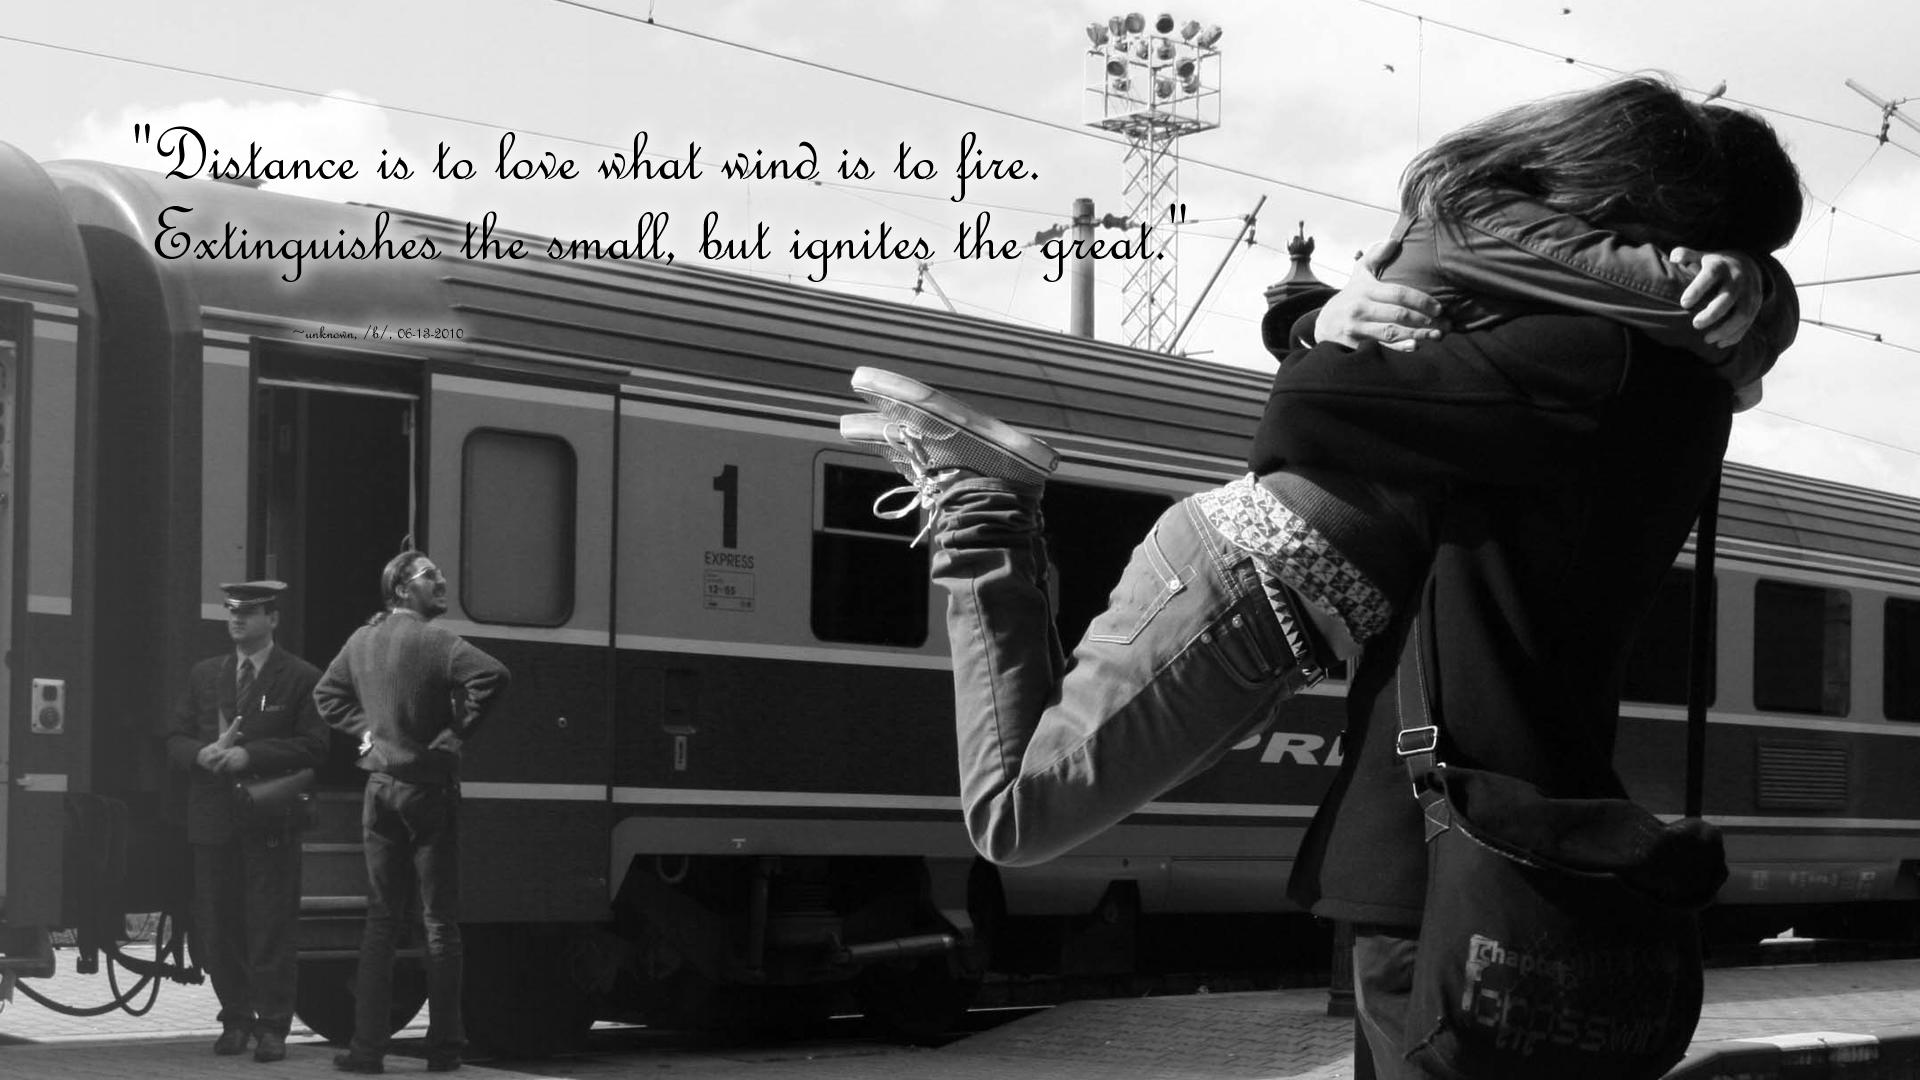 Love situation meet train black white